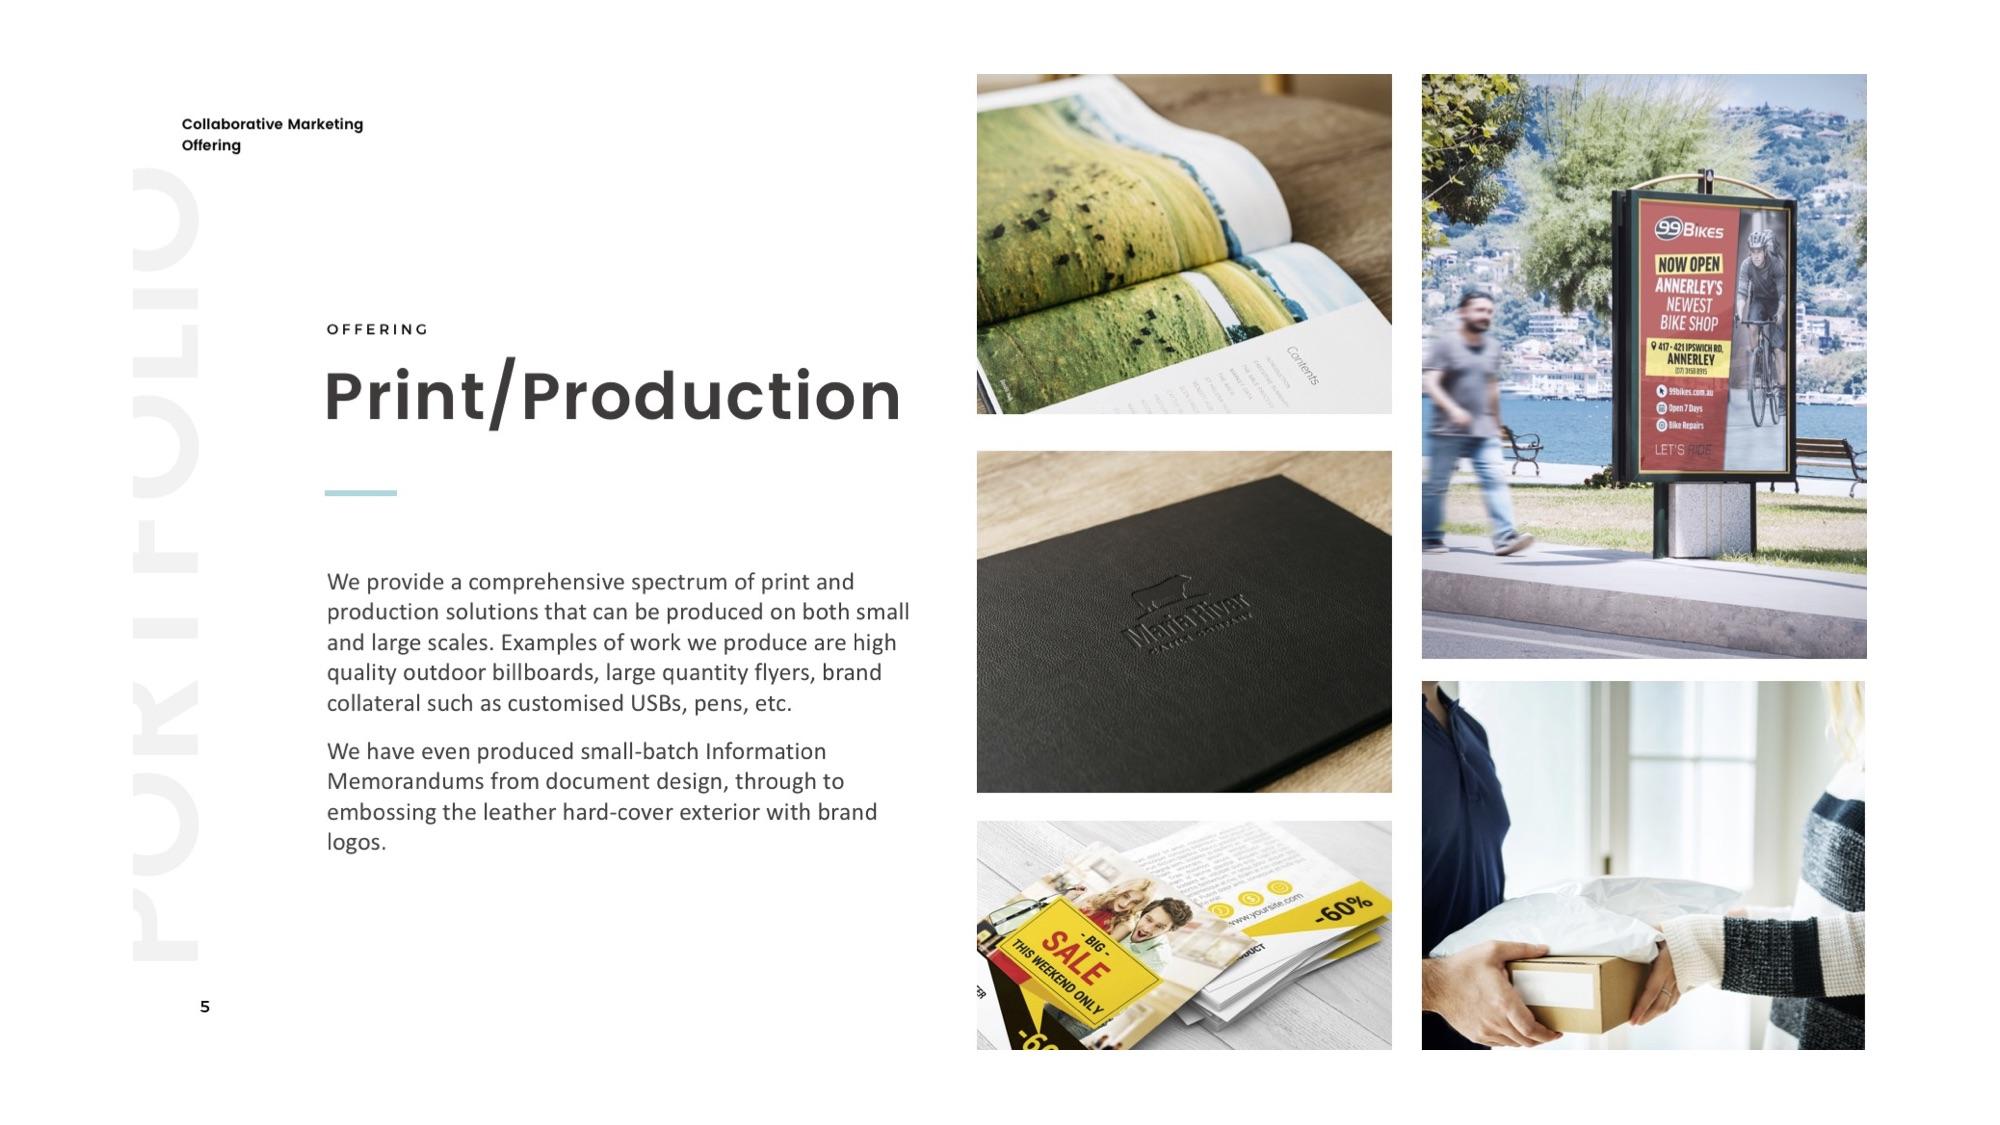 CM PRODUCTION - 20180712 - V3 copy 3w.jpg